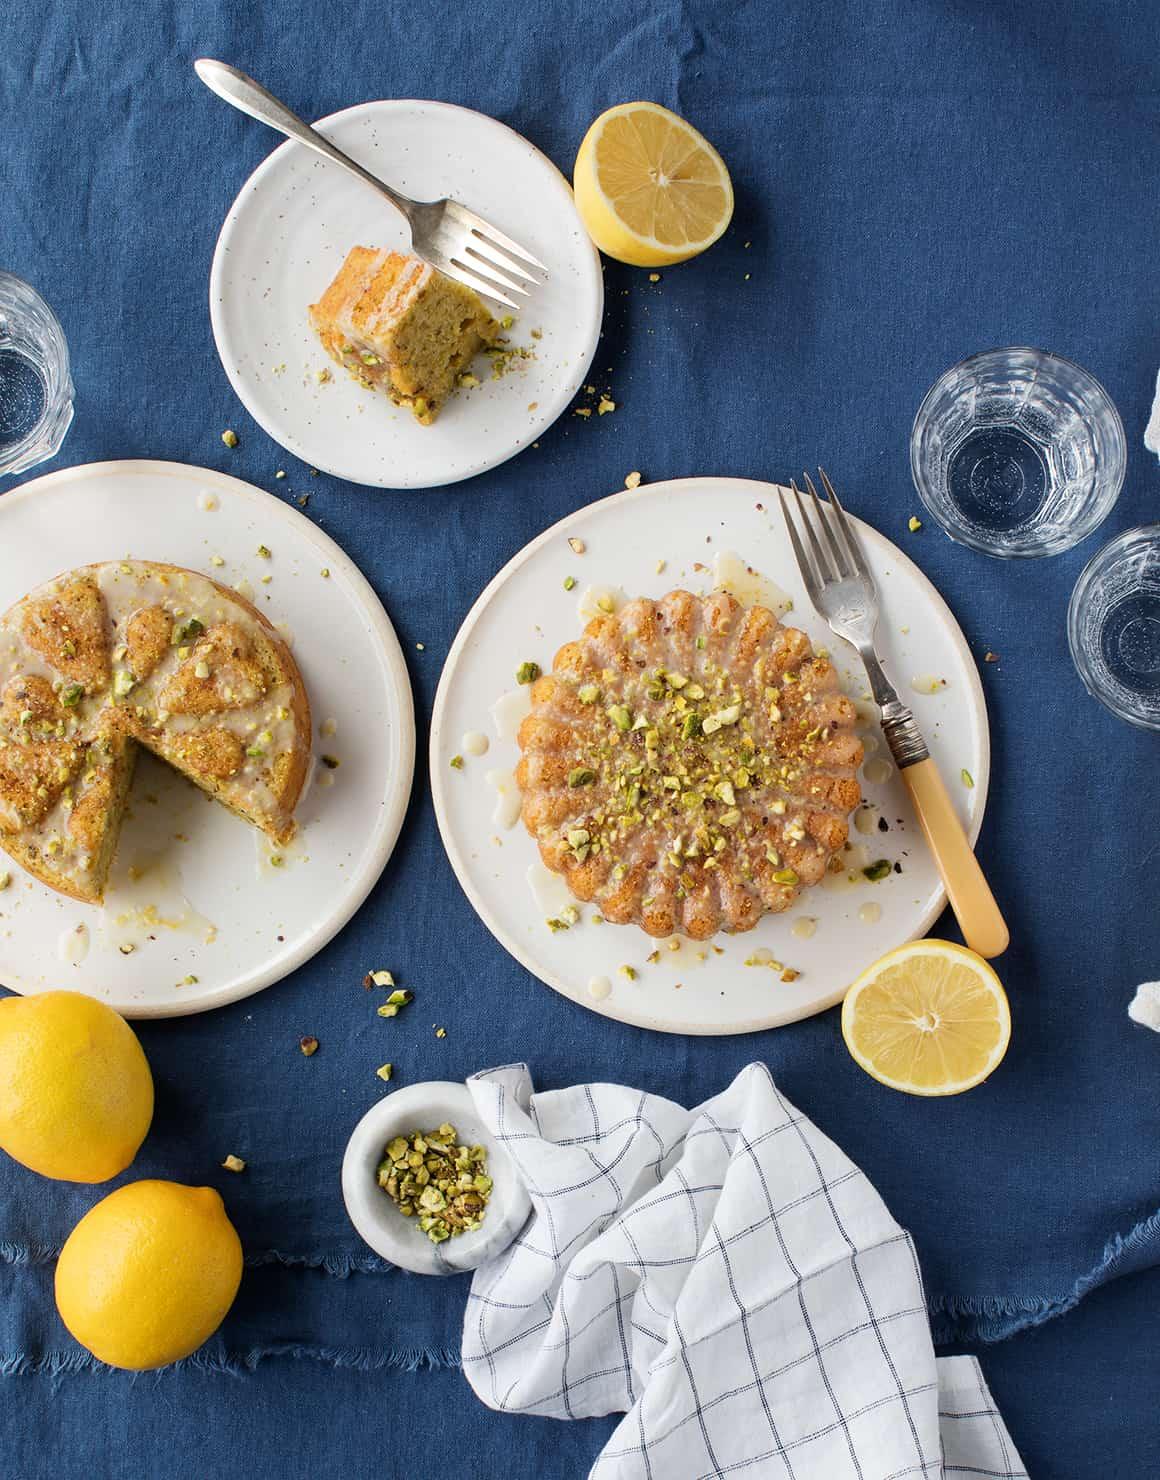 Lemon Olive Oil Pistachio Cake